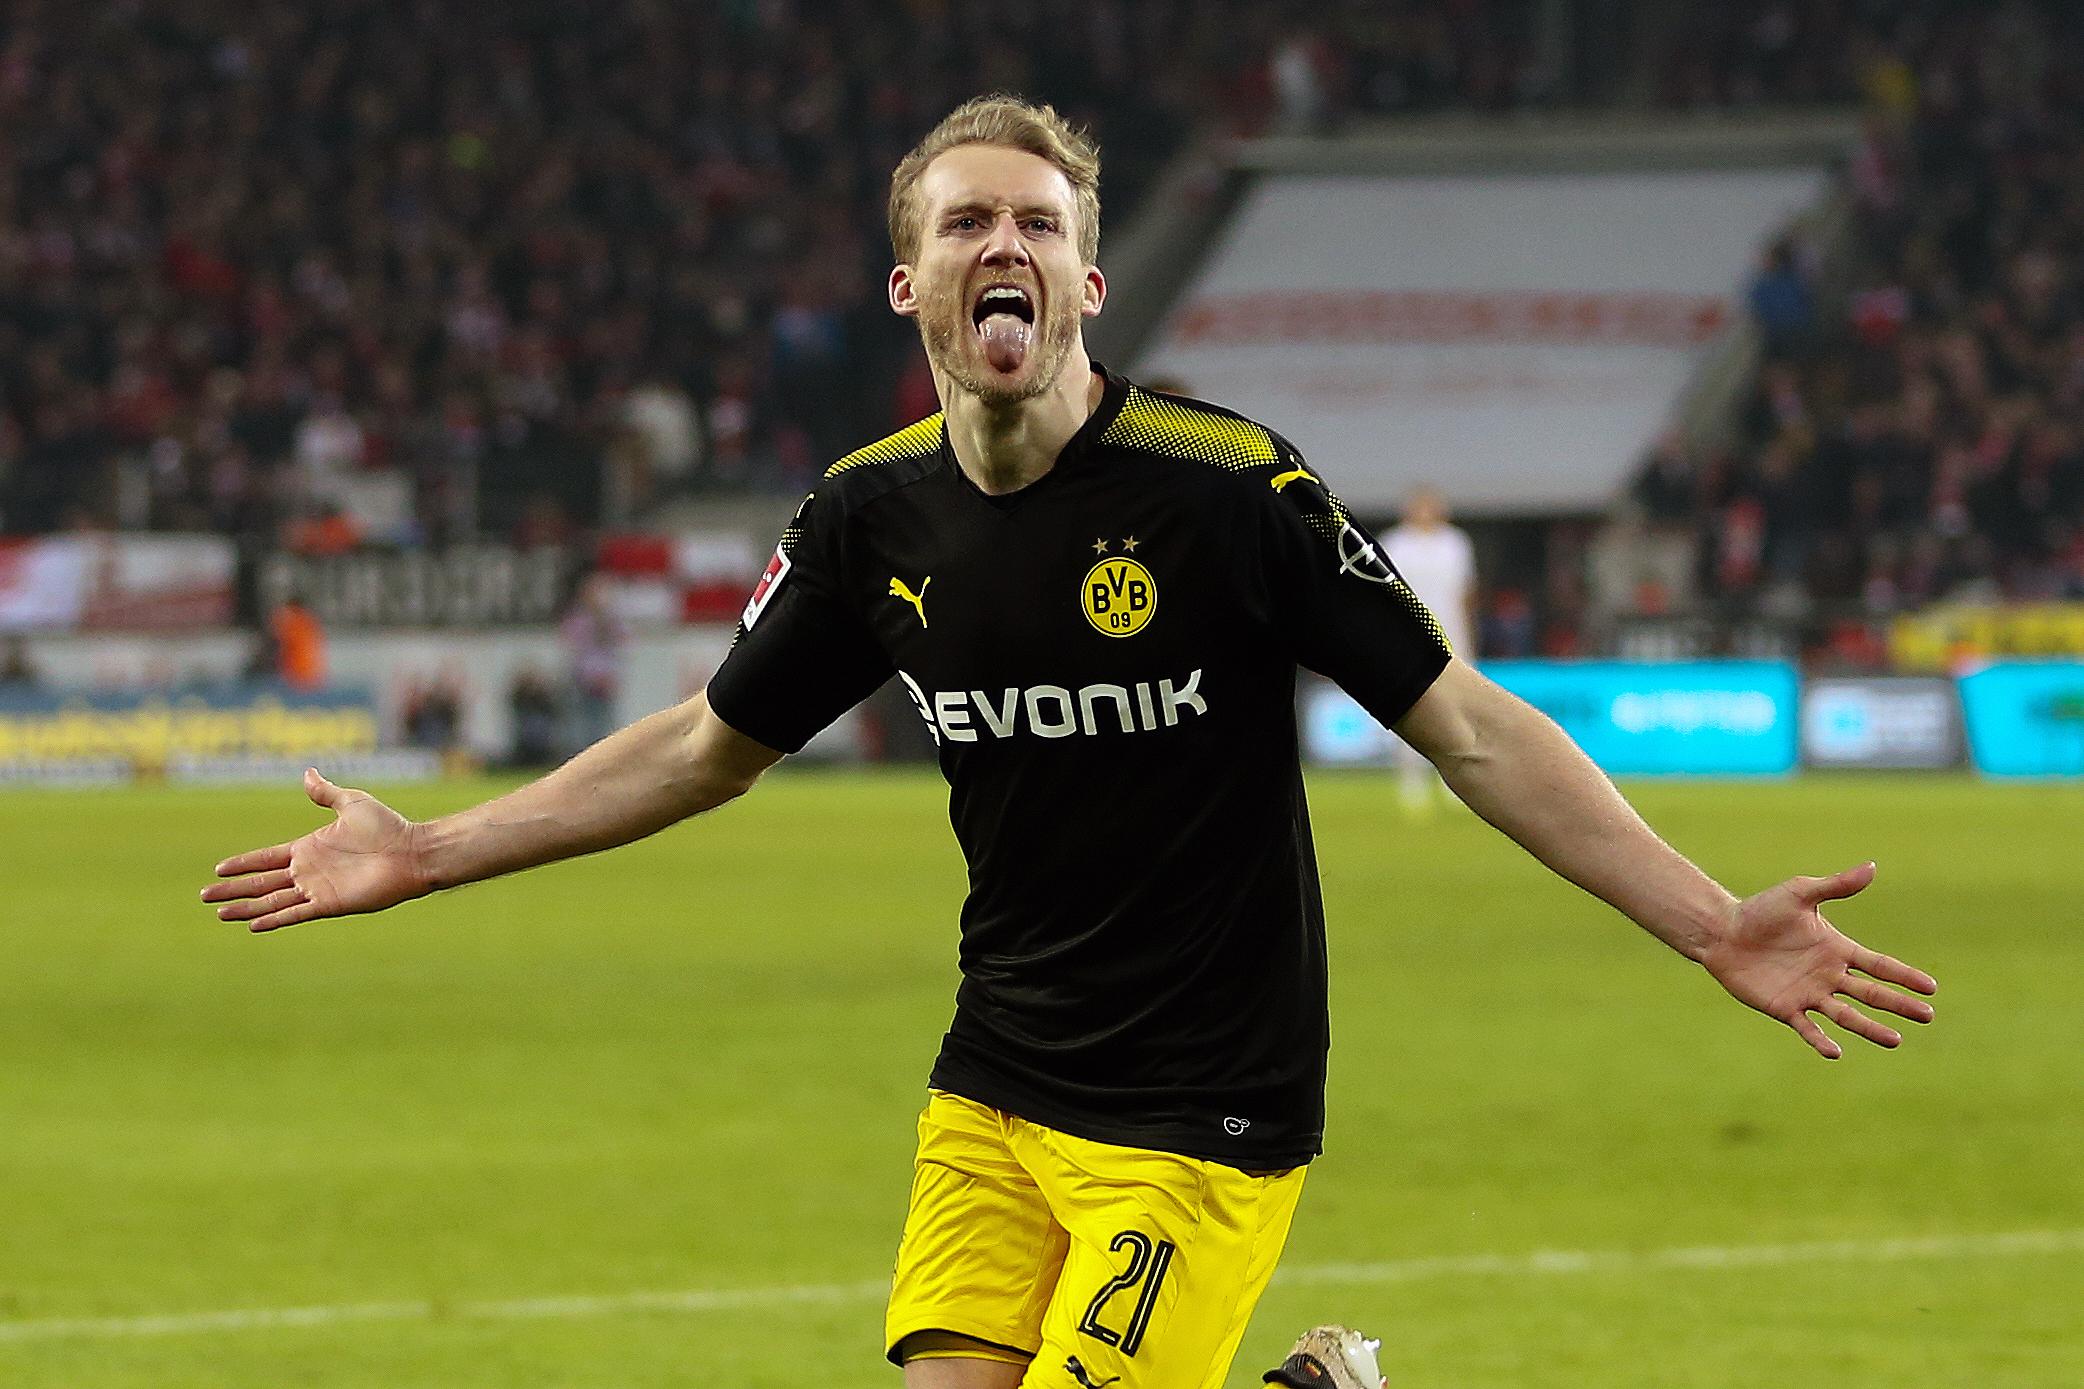 Schurrle celebrates scoring a goal. Image: PA